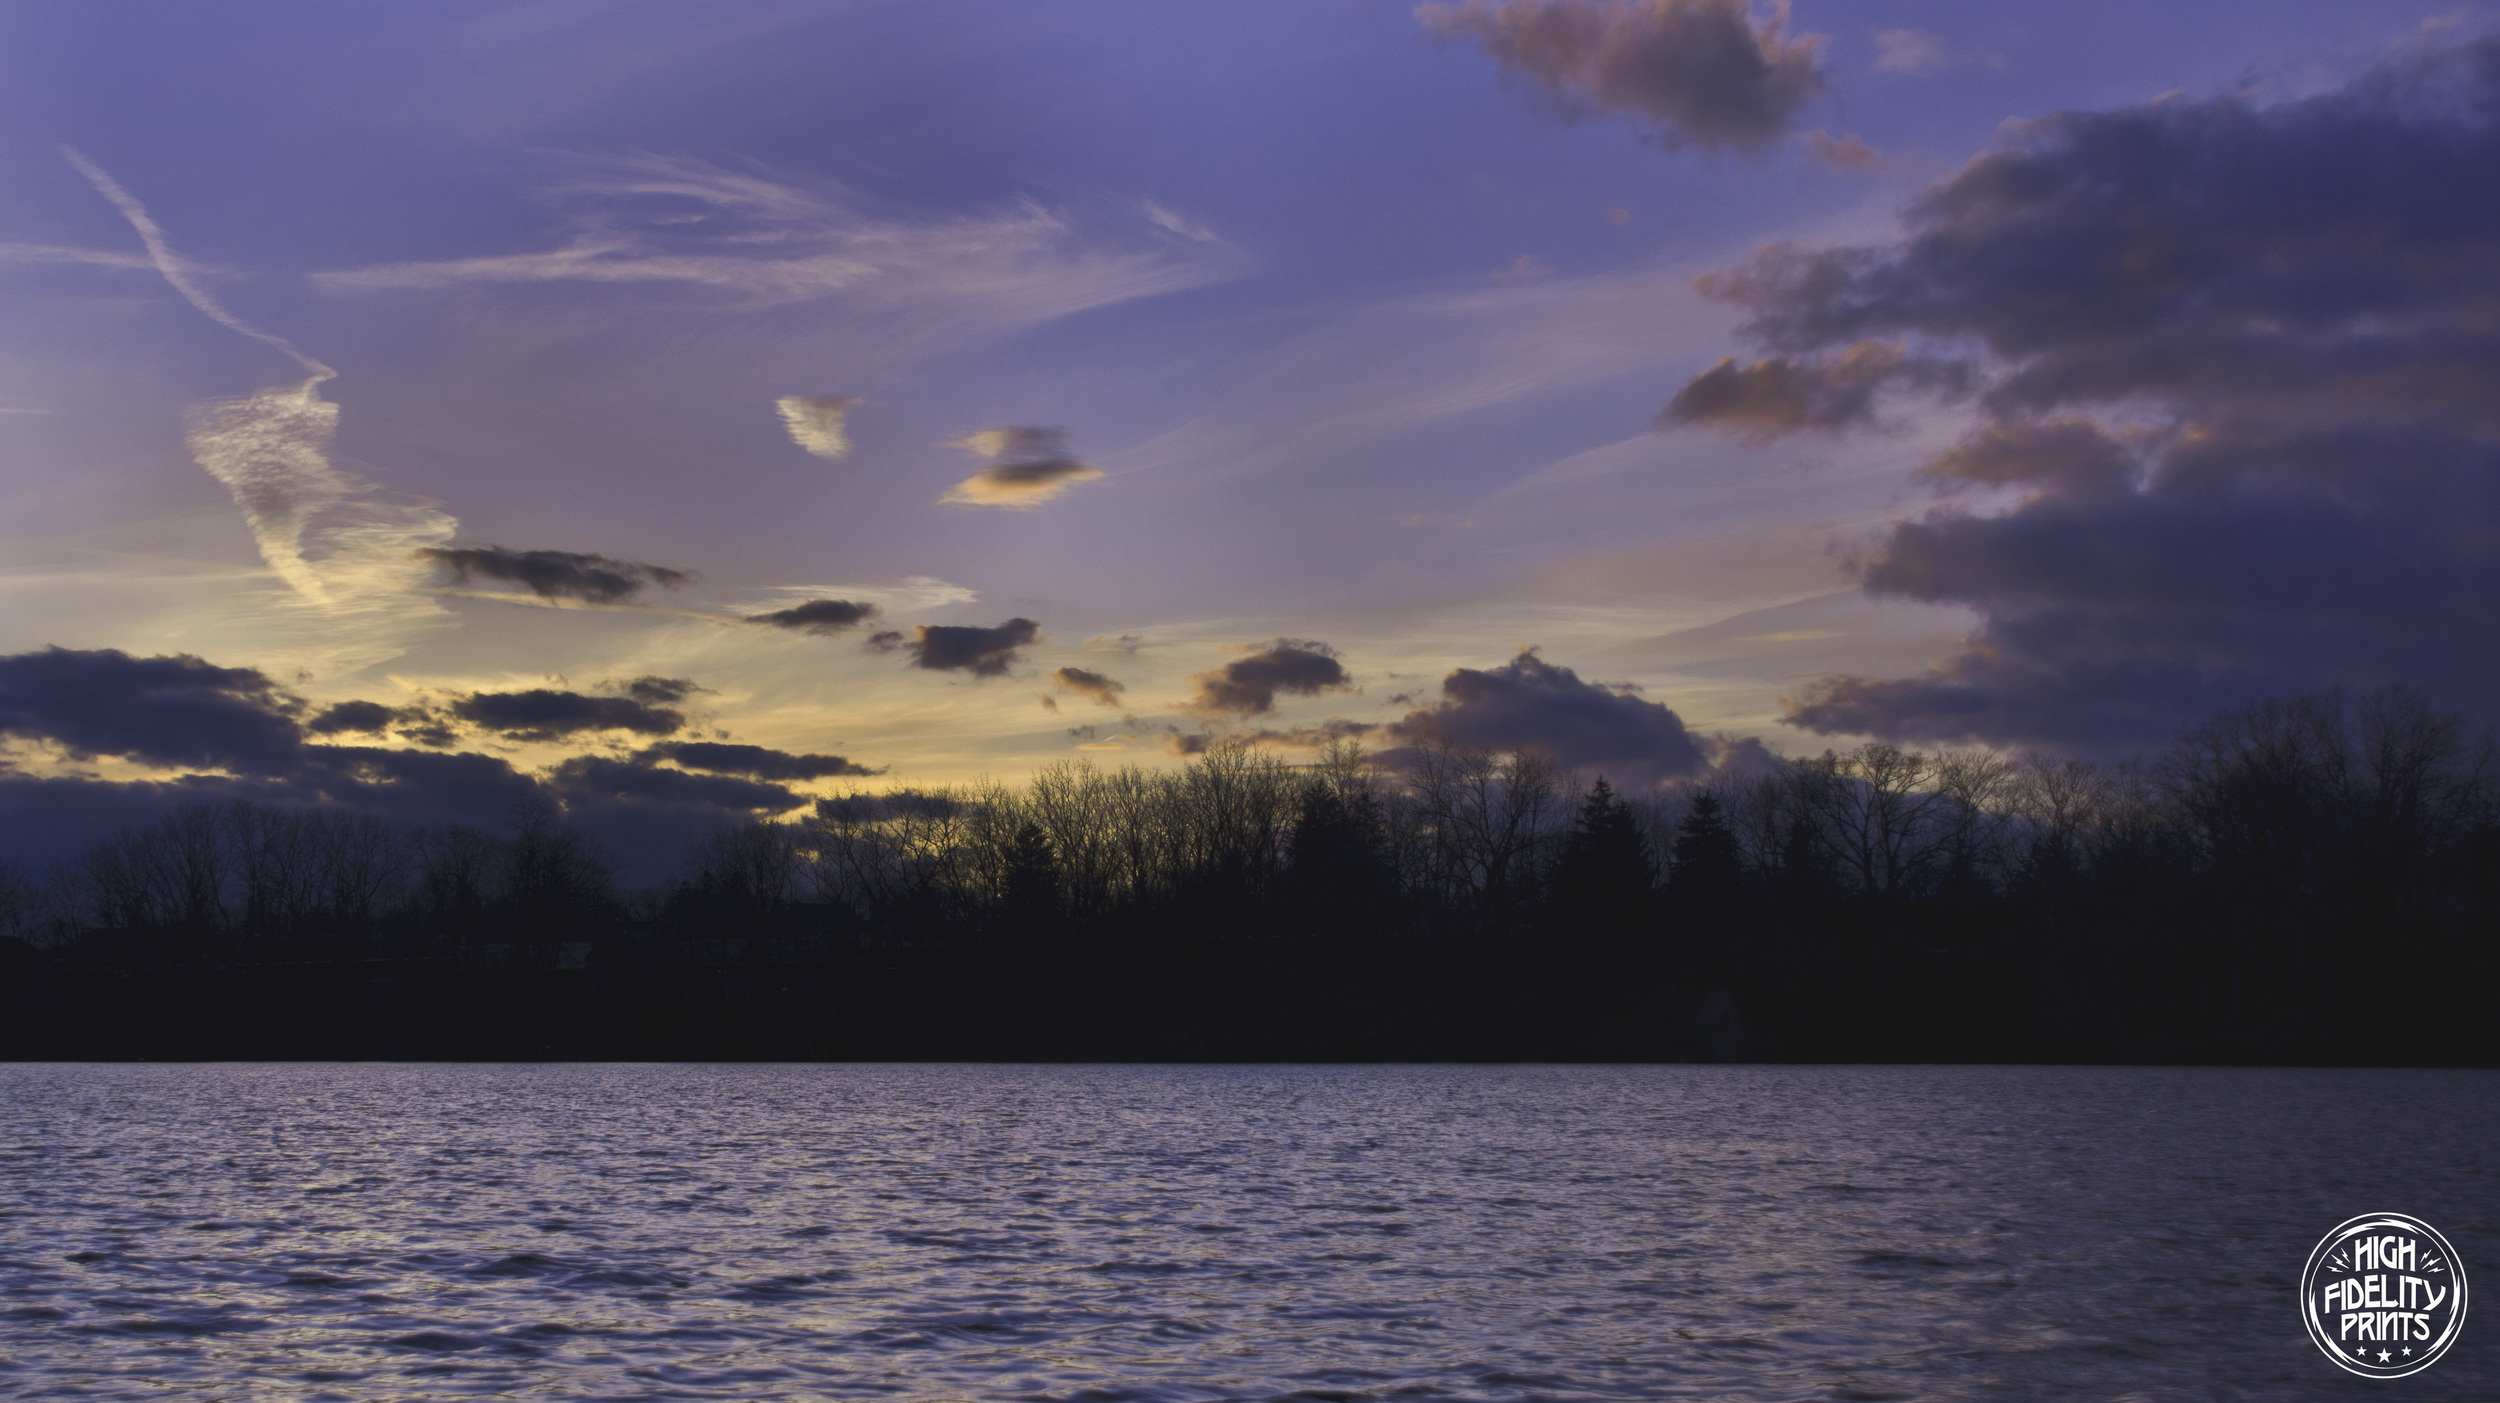 Sunset Sky over Van Cleef Lake